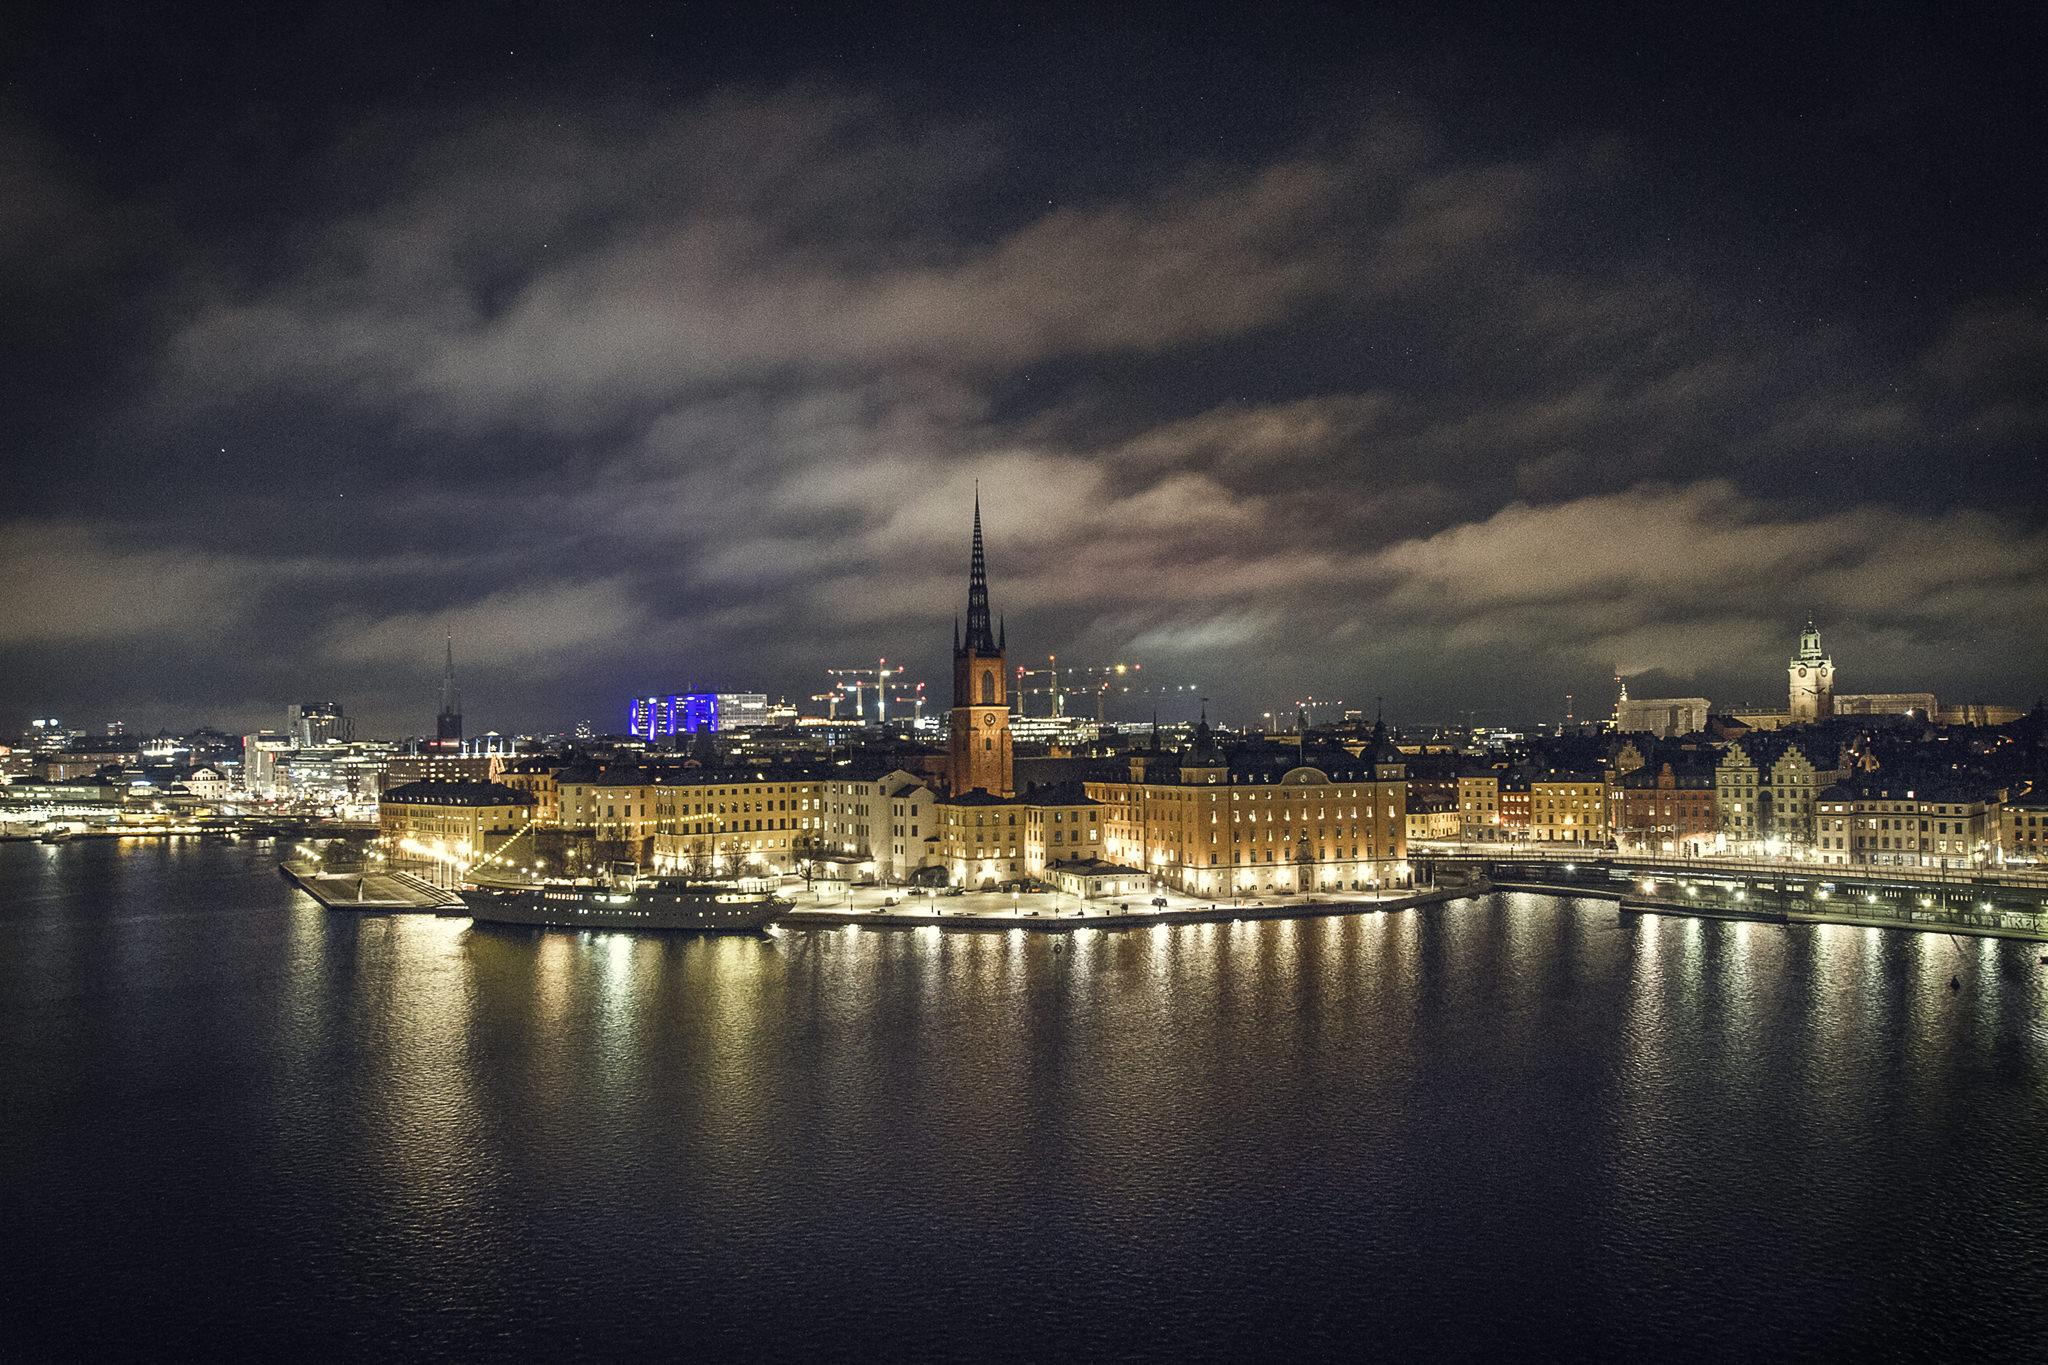 Stockholm Gamla Night Riddarholmen